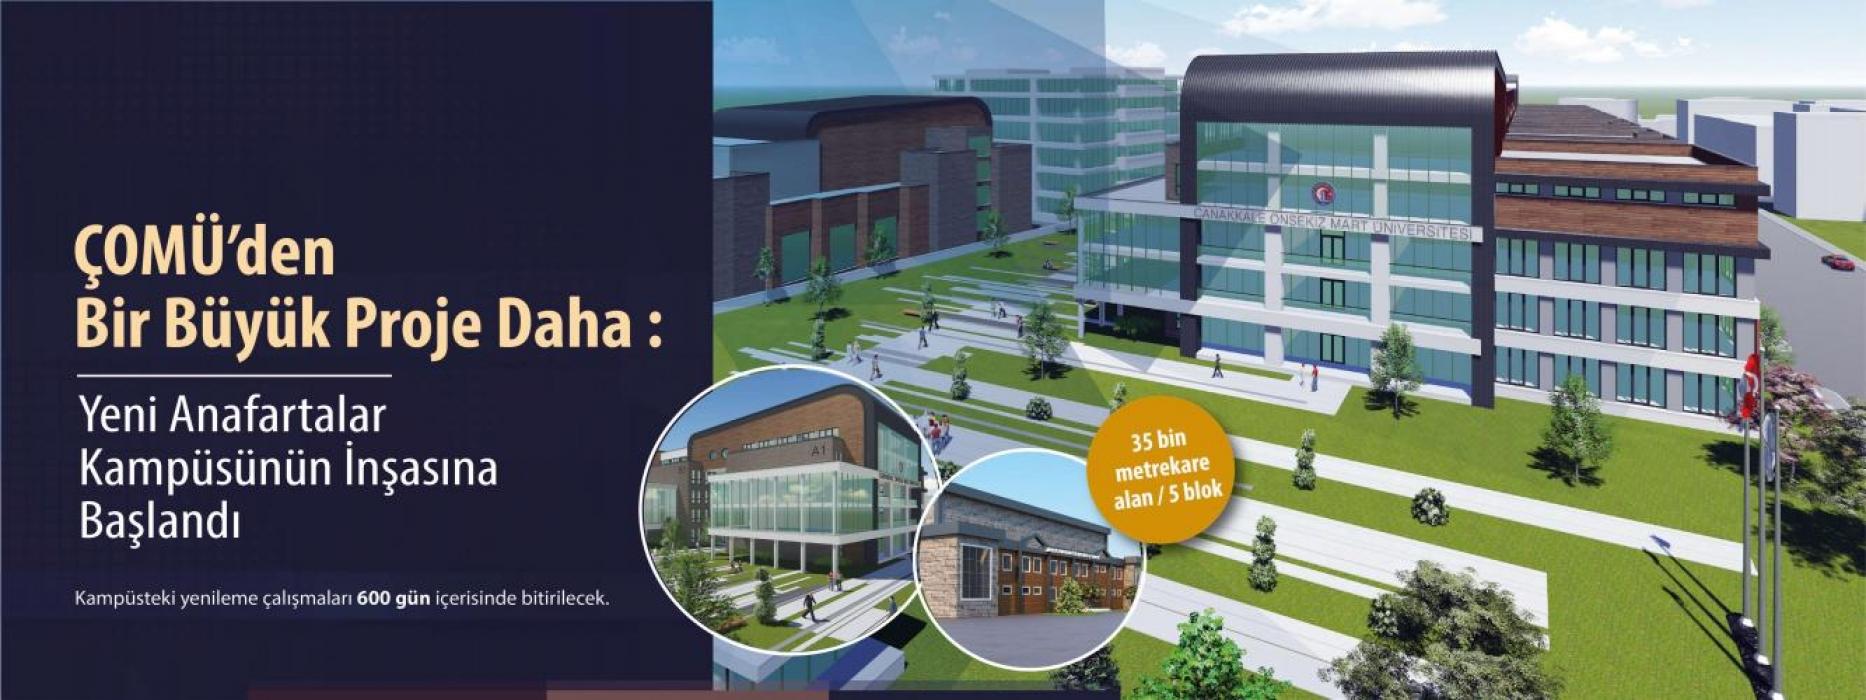 yeni-anafartalar-kampusunun-insasina-baslandi